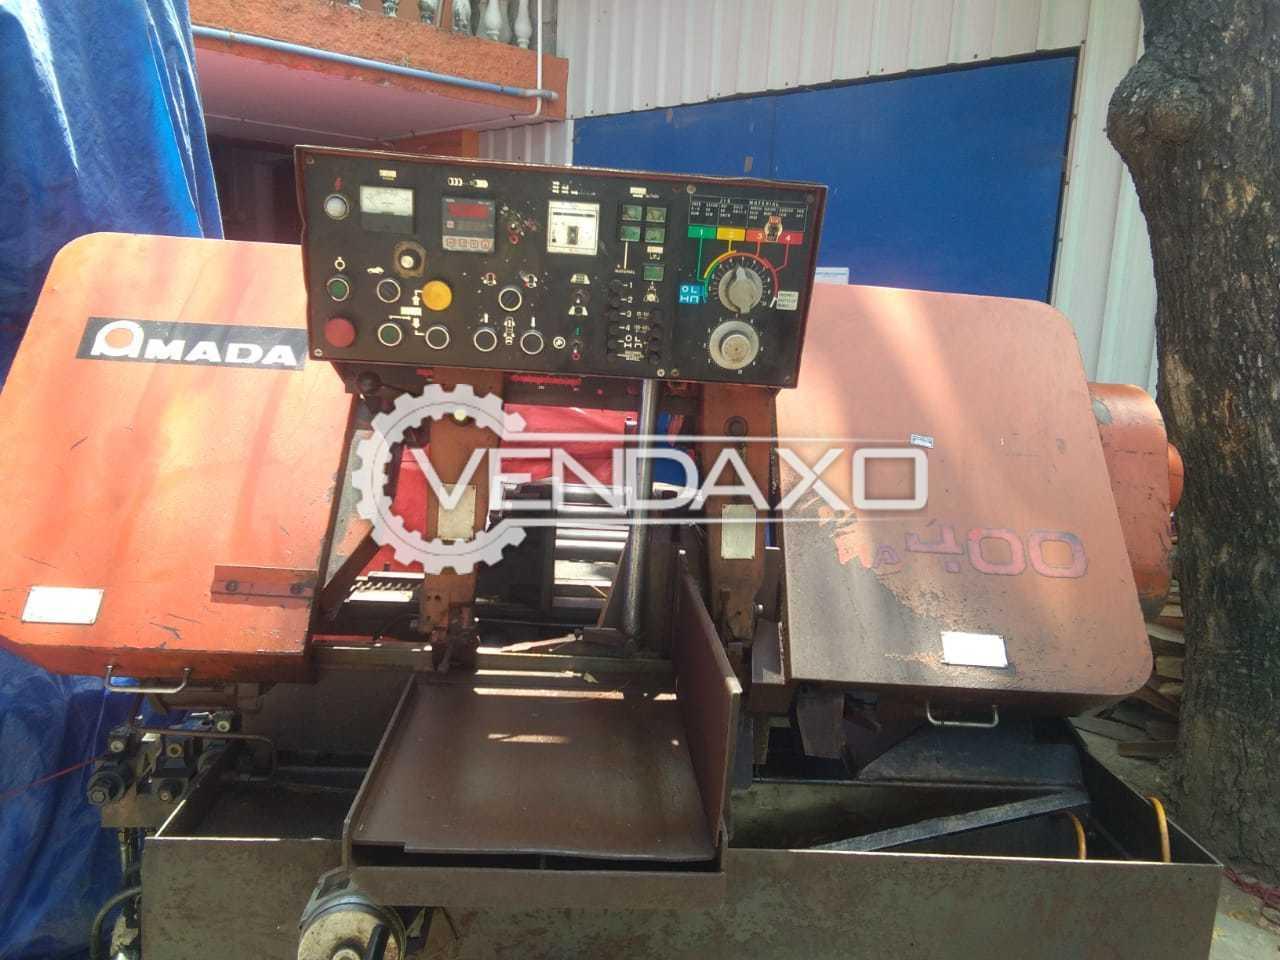 Amada HA-400 Fully Automatic Bandsaw Cutting Machine - Diameter - 400 mm